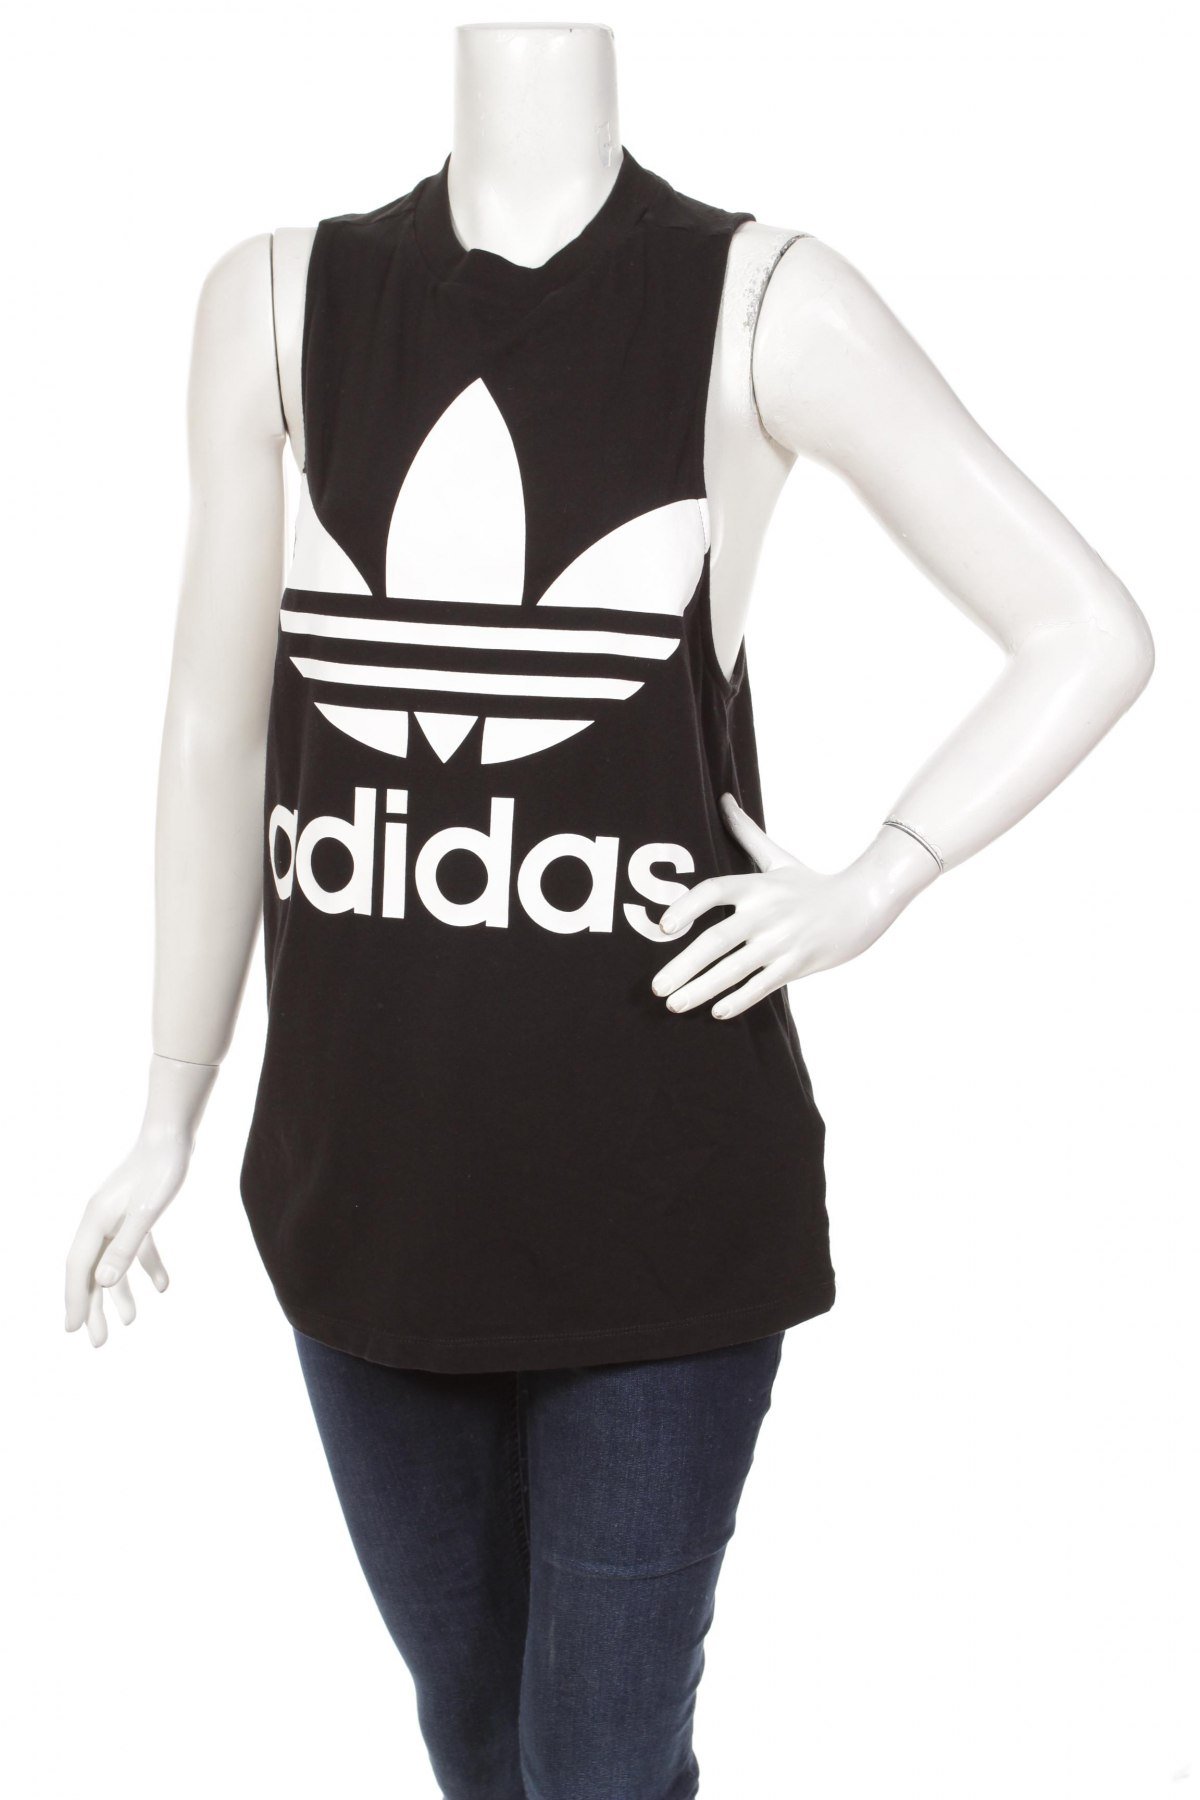 24644a10fa04 Dámske tielko Adidas Originals - za výhodné ceny na Remix -  103111642